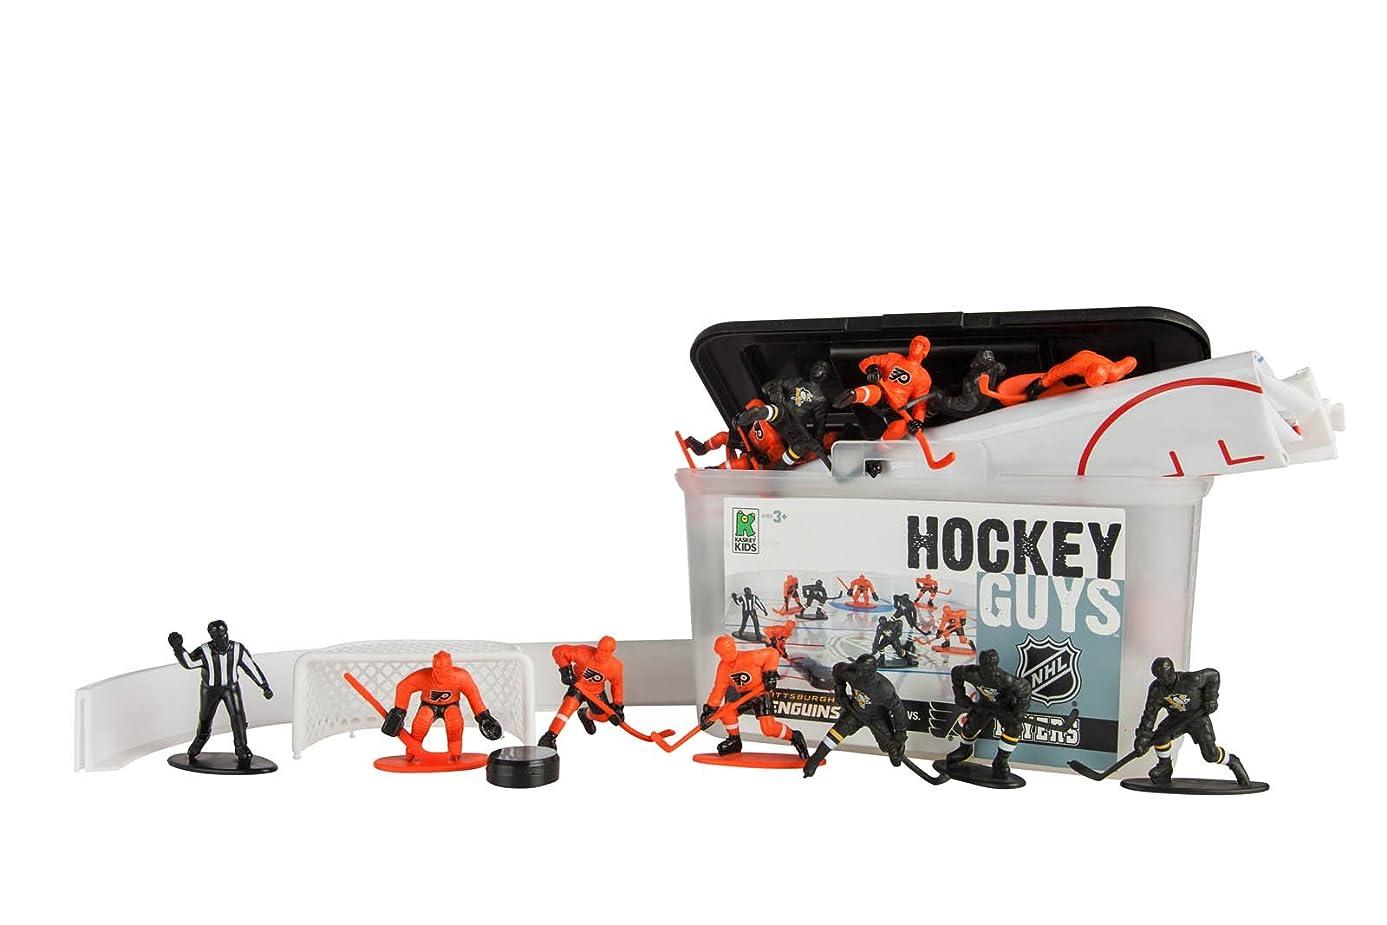 Kaskey Kids Hockey Guys: Flyers vs. Penguins Action Figure